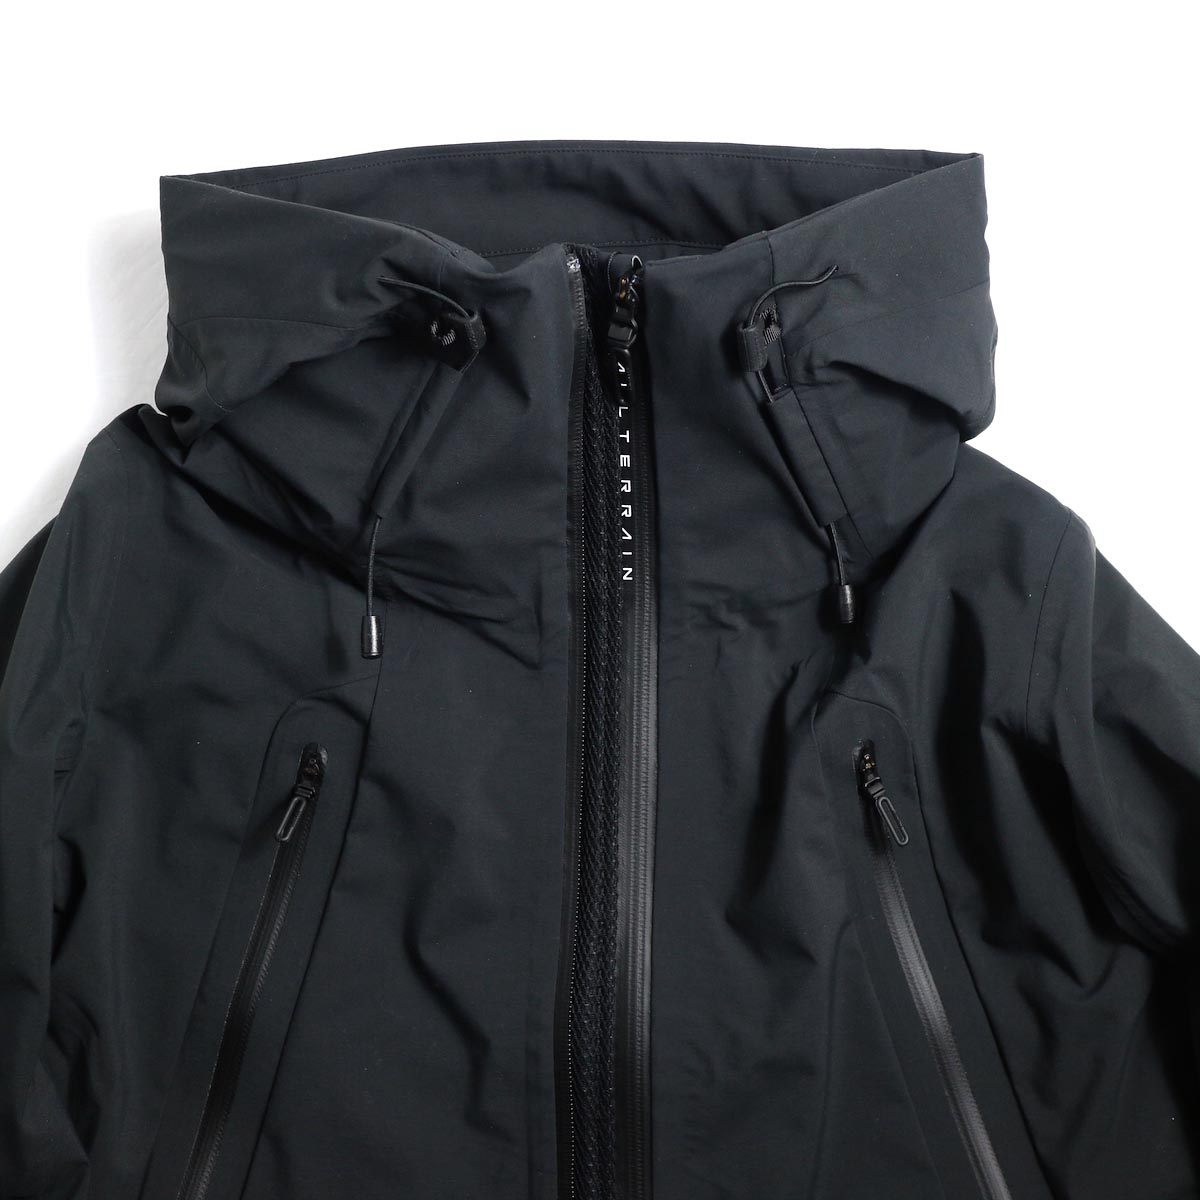 "DESCENTE ALLTERAIN / Hard Shell Jacket ""CREAS"" 襟"